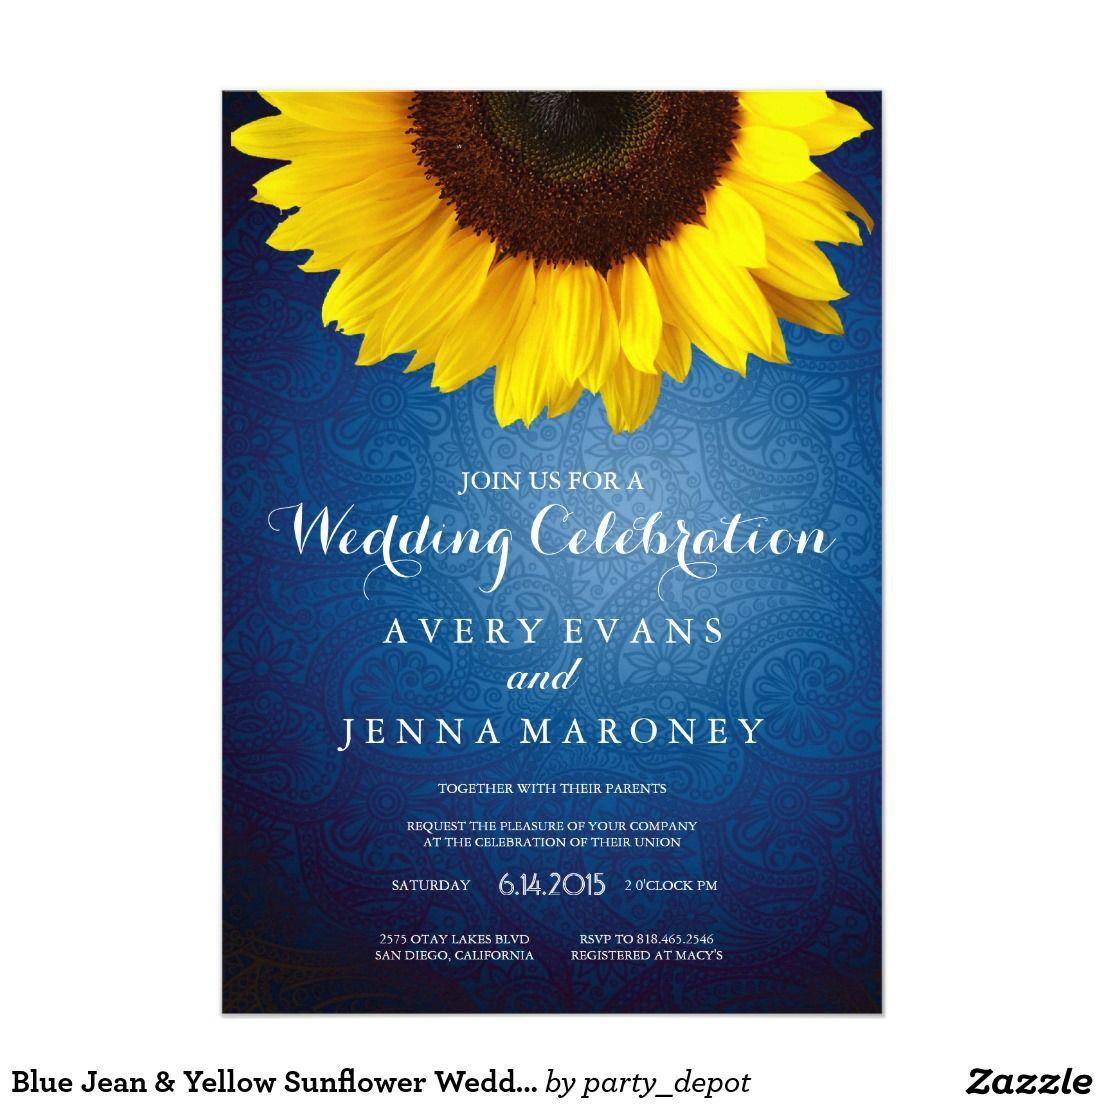 Blue Jean & Yellow Sunflower Wedding Invitation